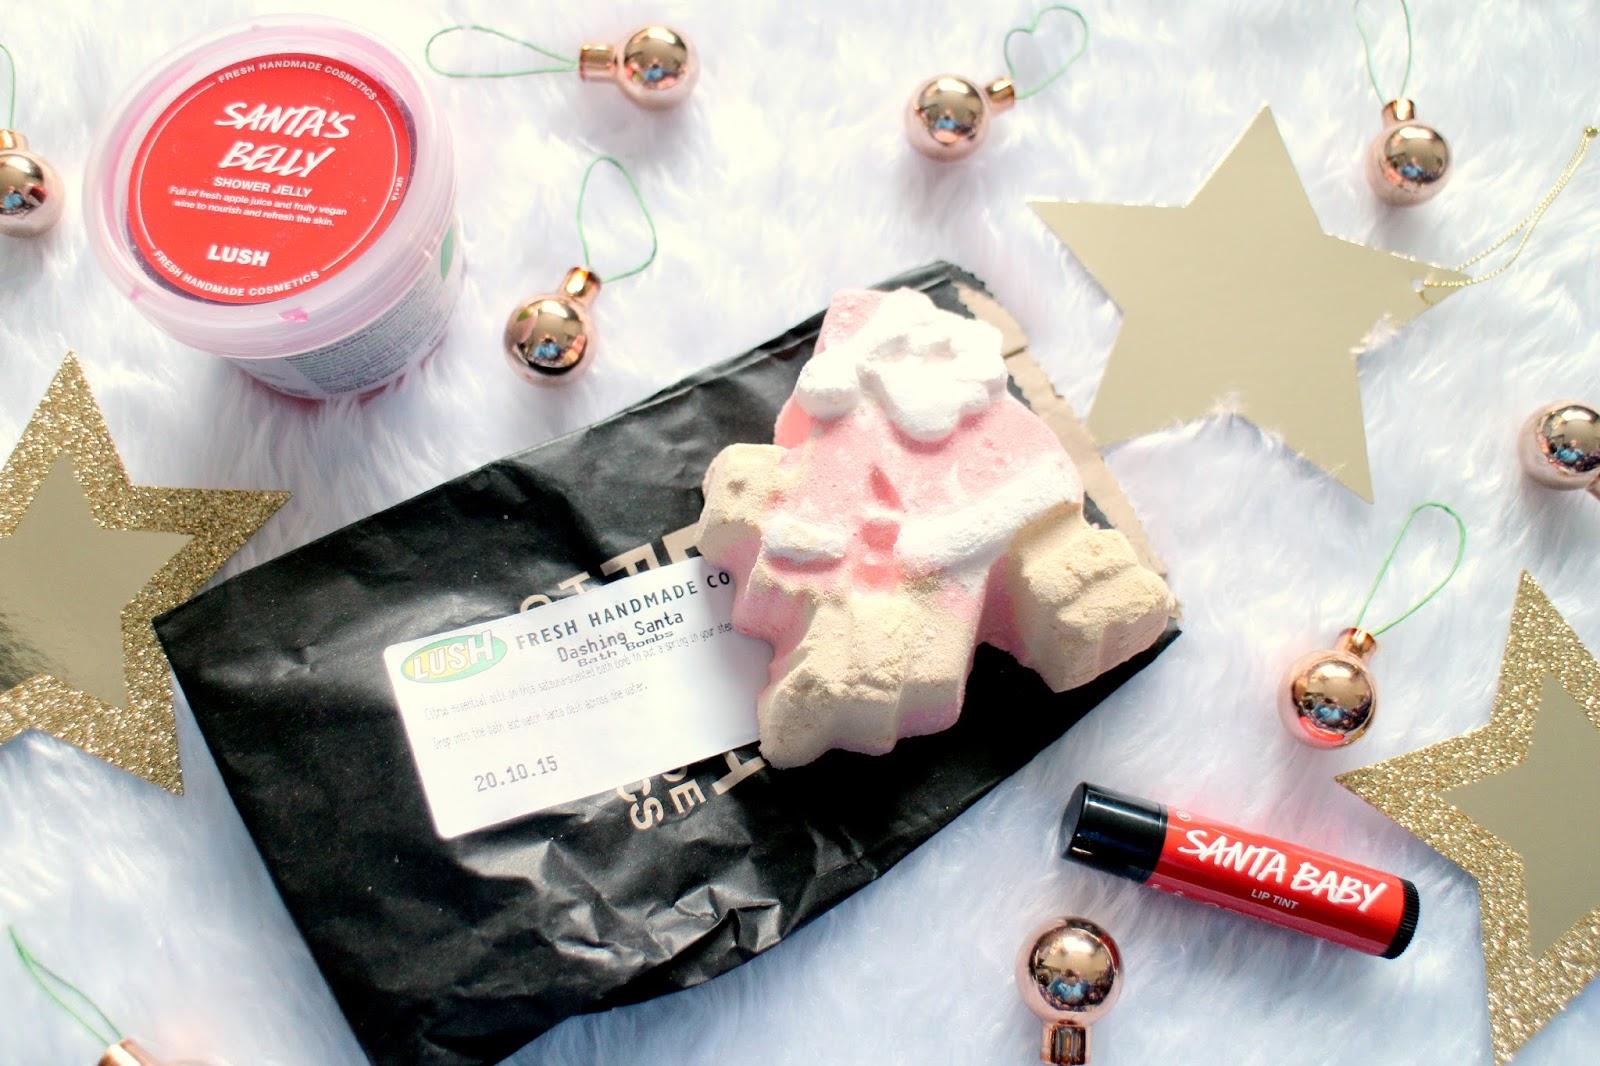 Lush Santa Review